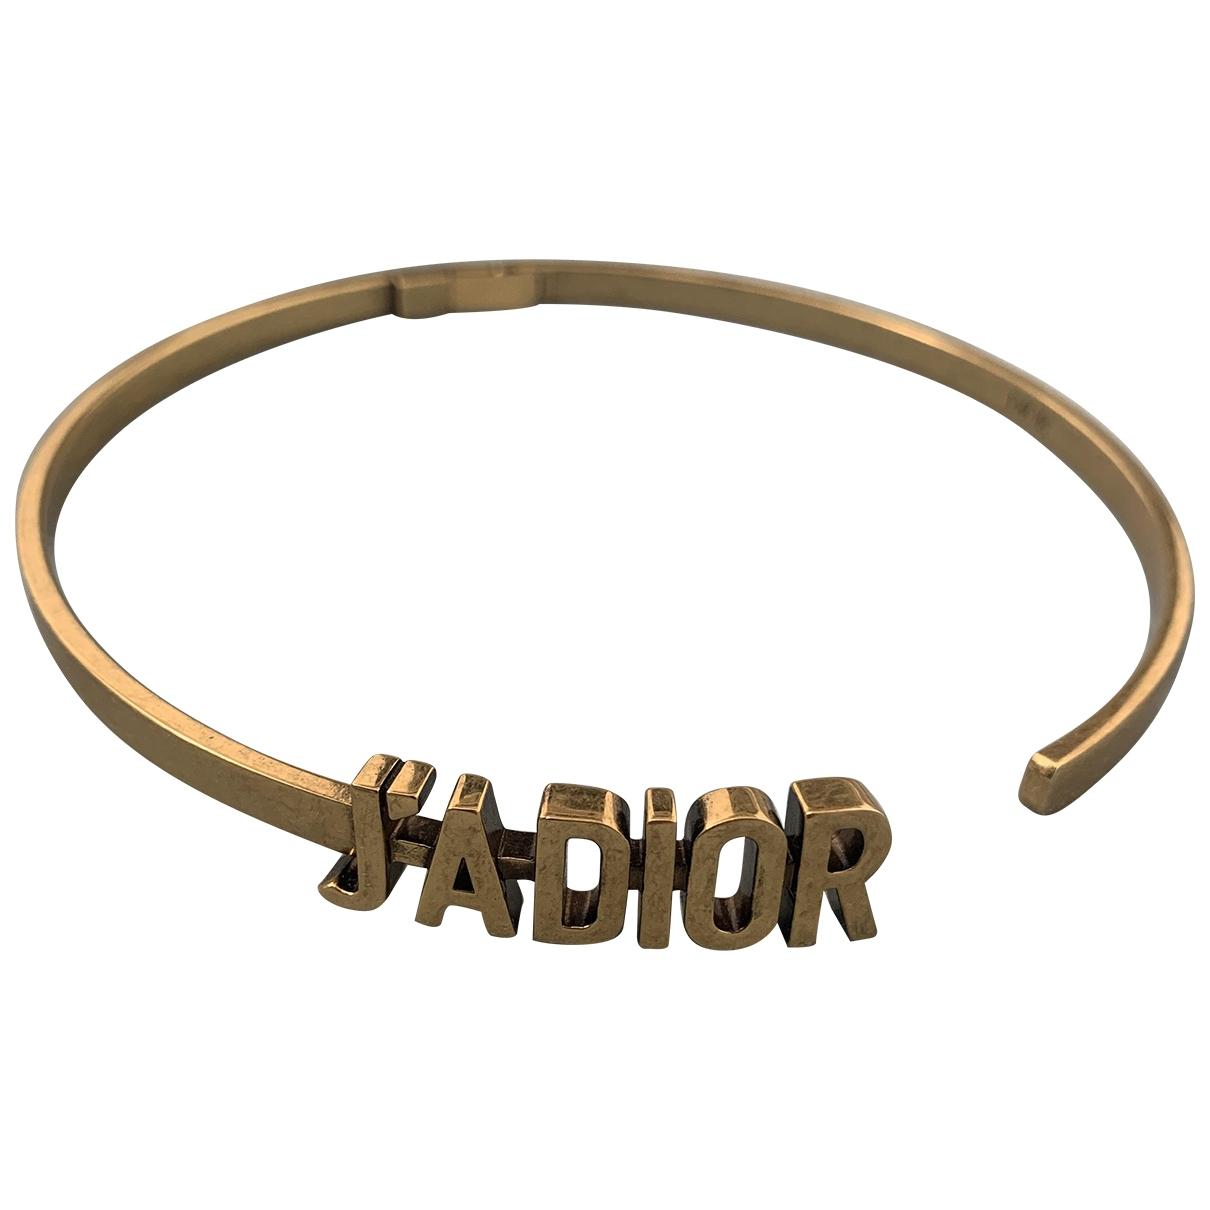 Dior - Collier Jadior pour femme en metal - dore